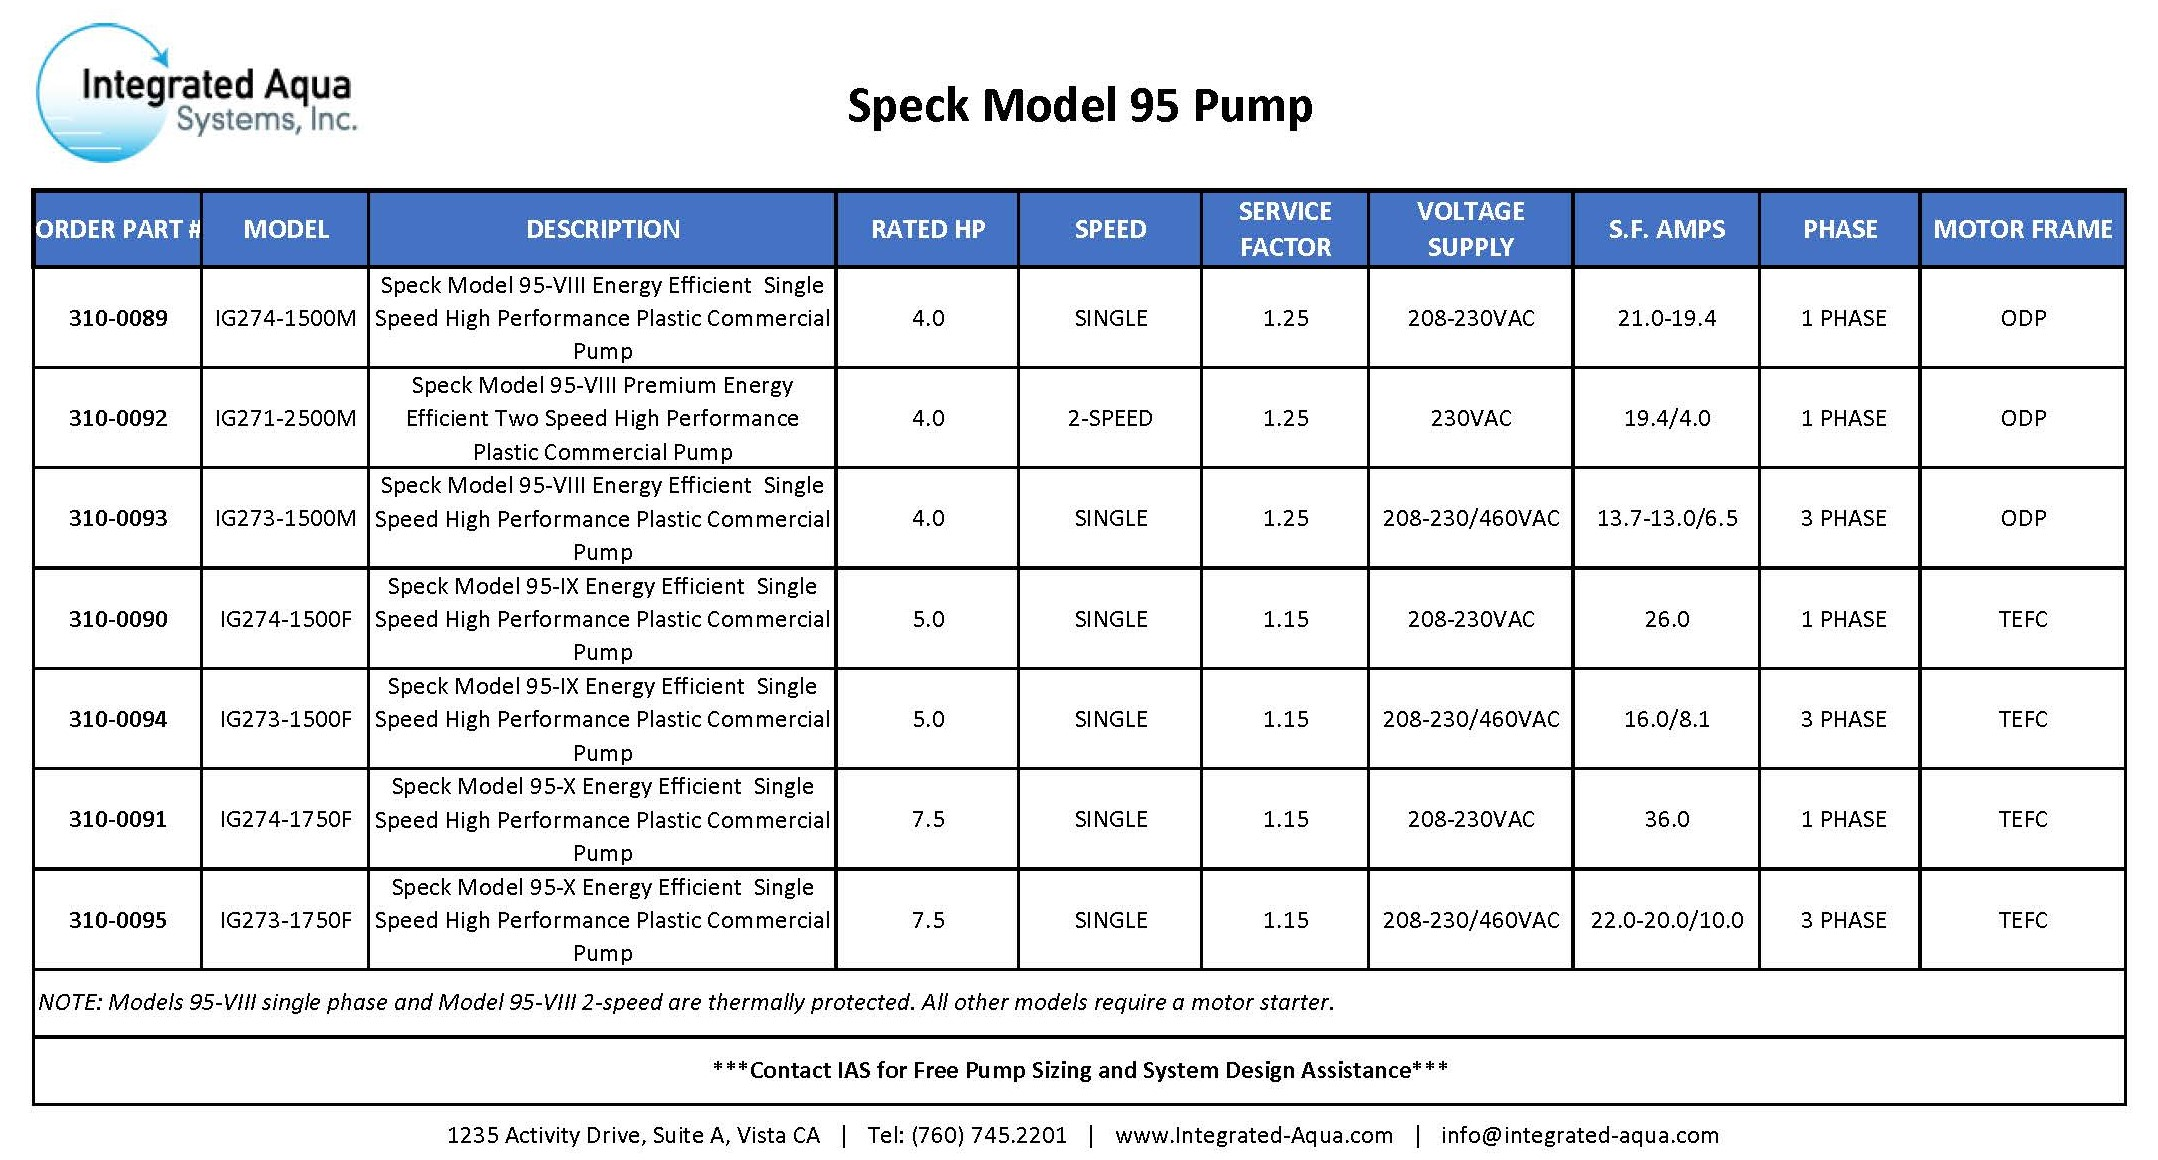 Speck Model 95 Pump Table